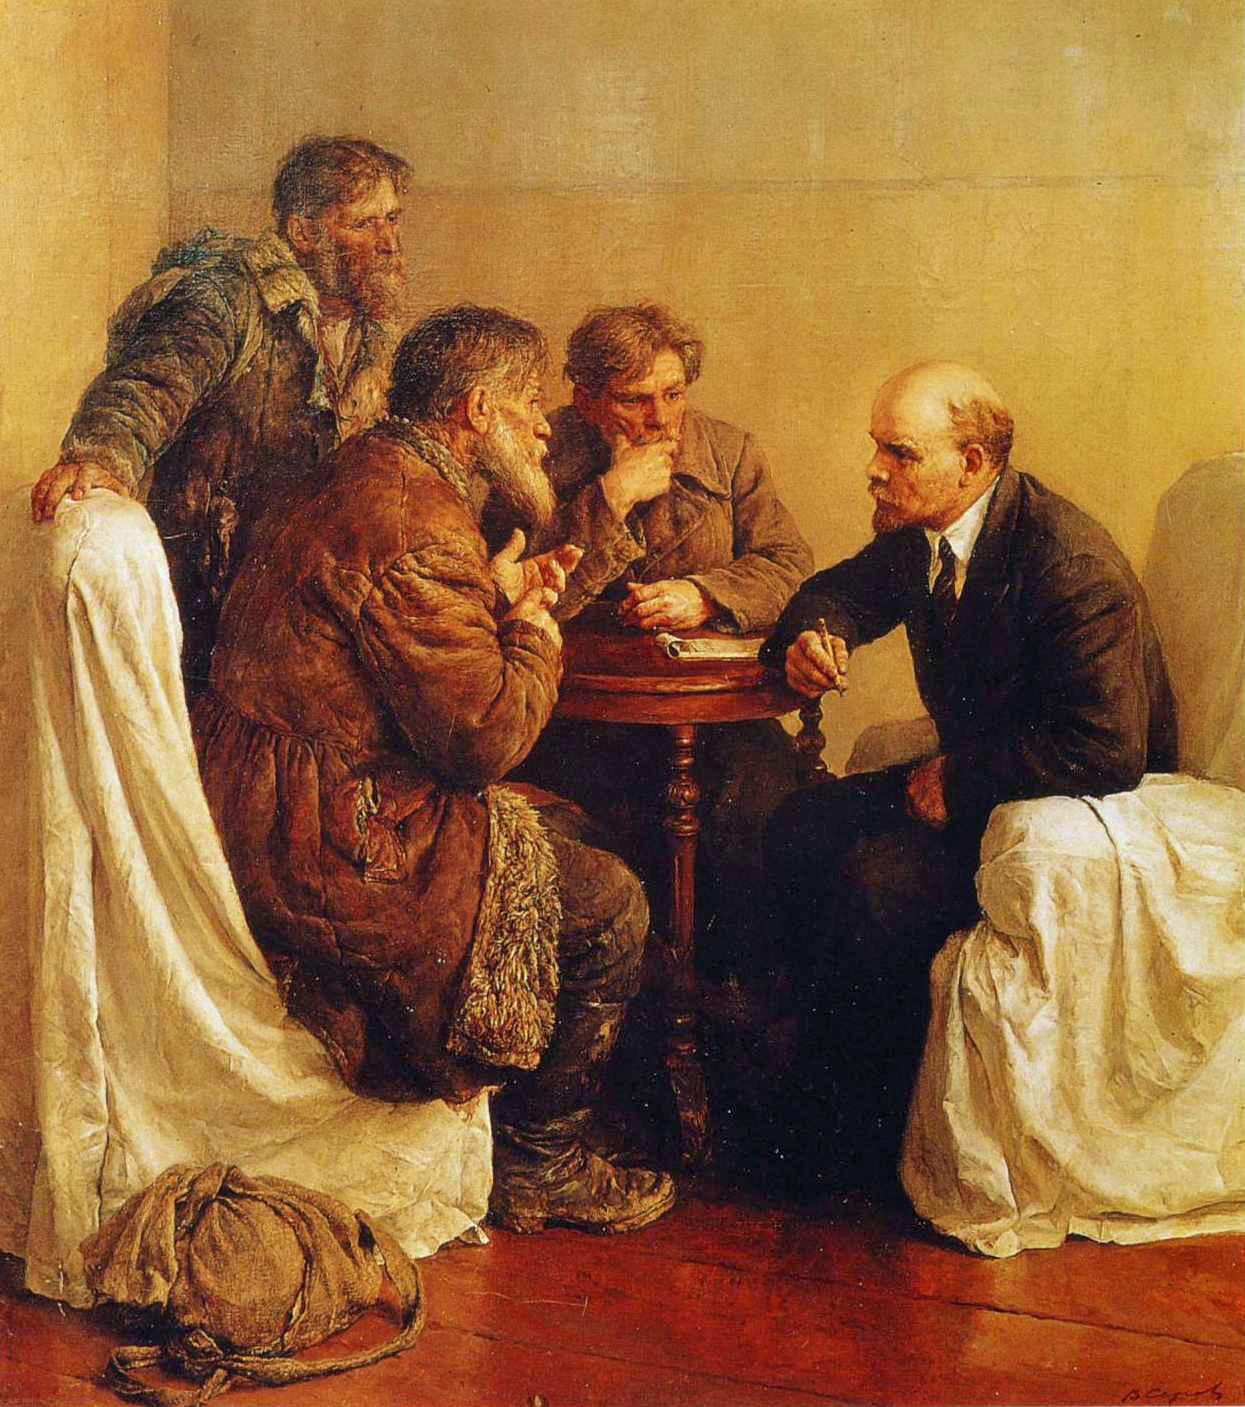 Vladimir Serov - Peasant Petitioners Visiting Lenin